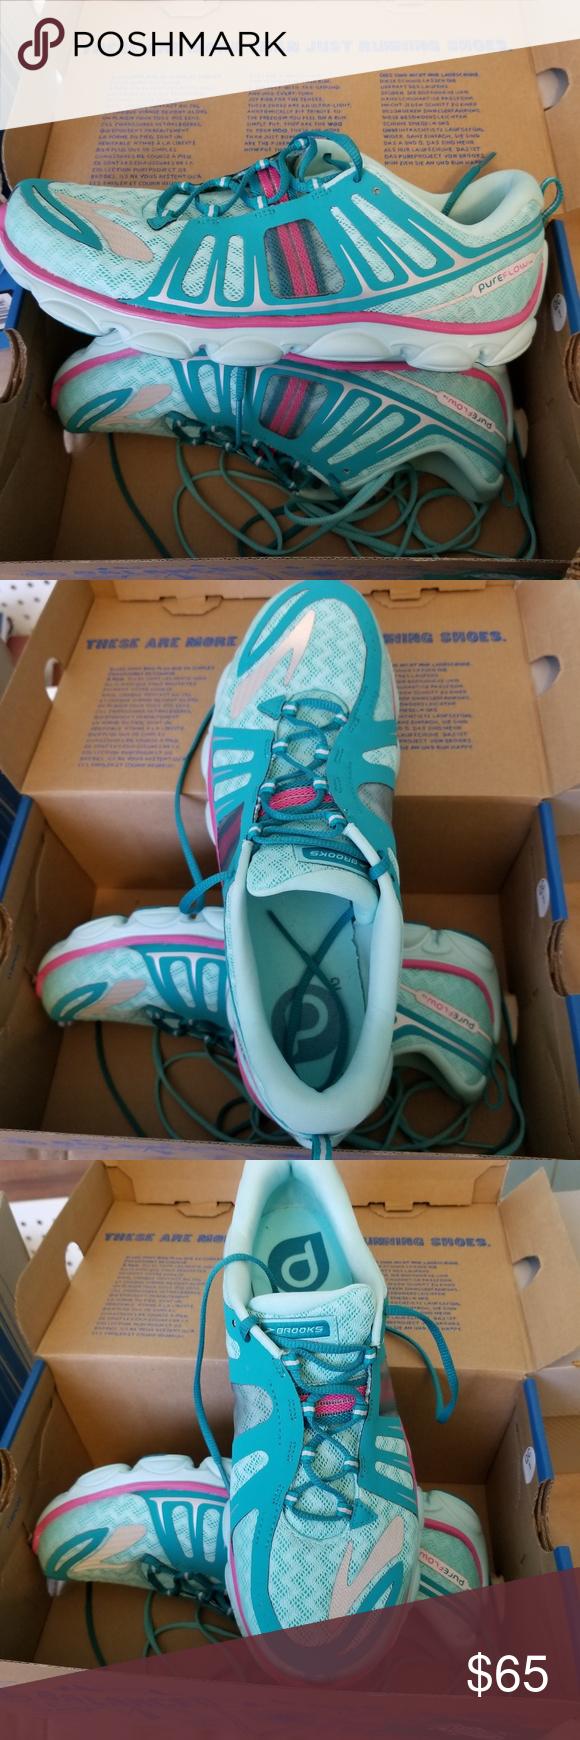 370ceb8c1db Brooks Kids Pure Flow 2 Size 6.5 Brand new! Brooks Kids Pure Flow 2 Youth  Size 6.5 Brooks Shoes Sneakers